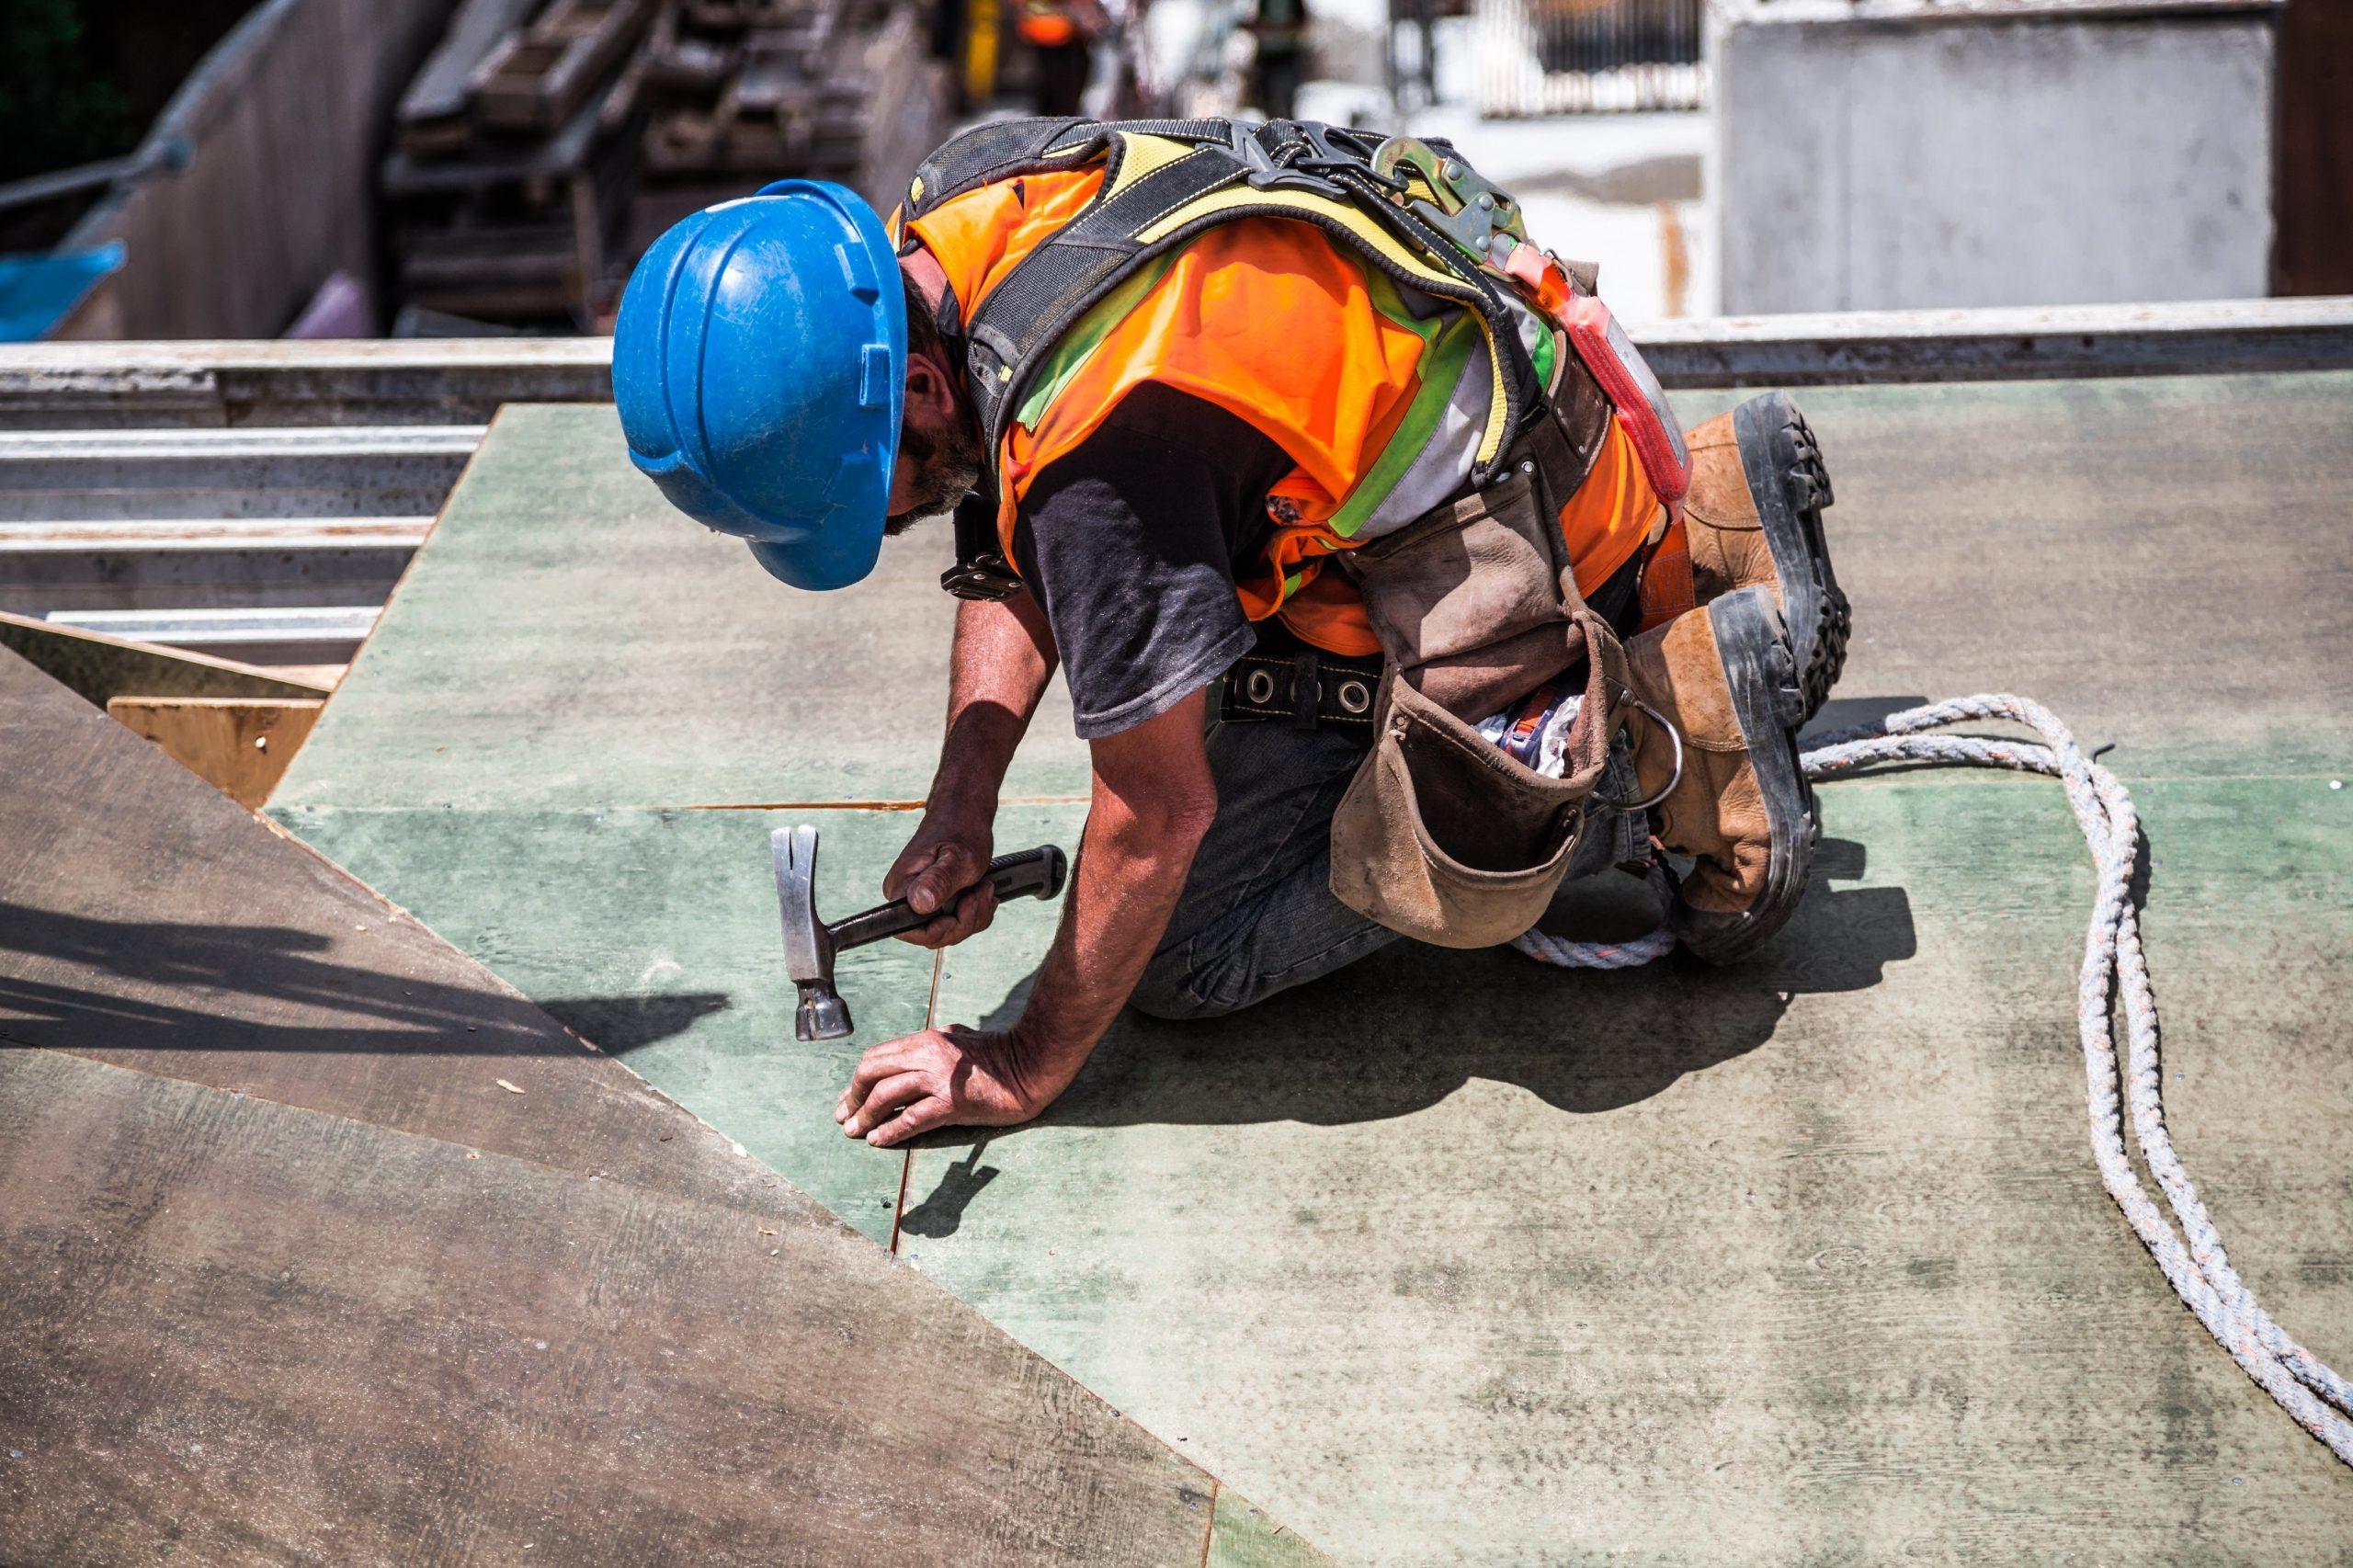 Arbeitsunfälle und Berufskrankheiten -Monatsinformation Oktober 2020 (8. Newsletter)